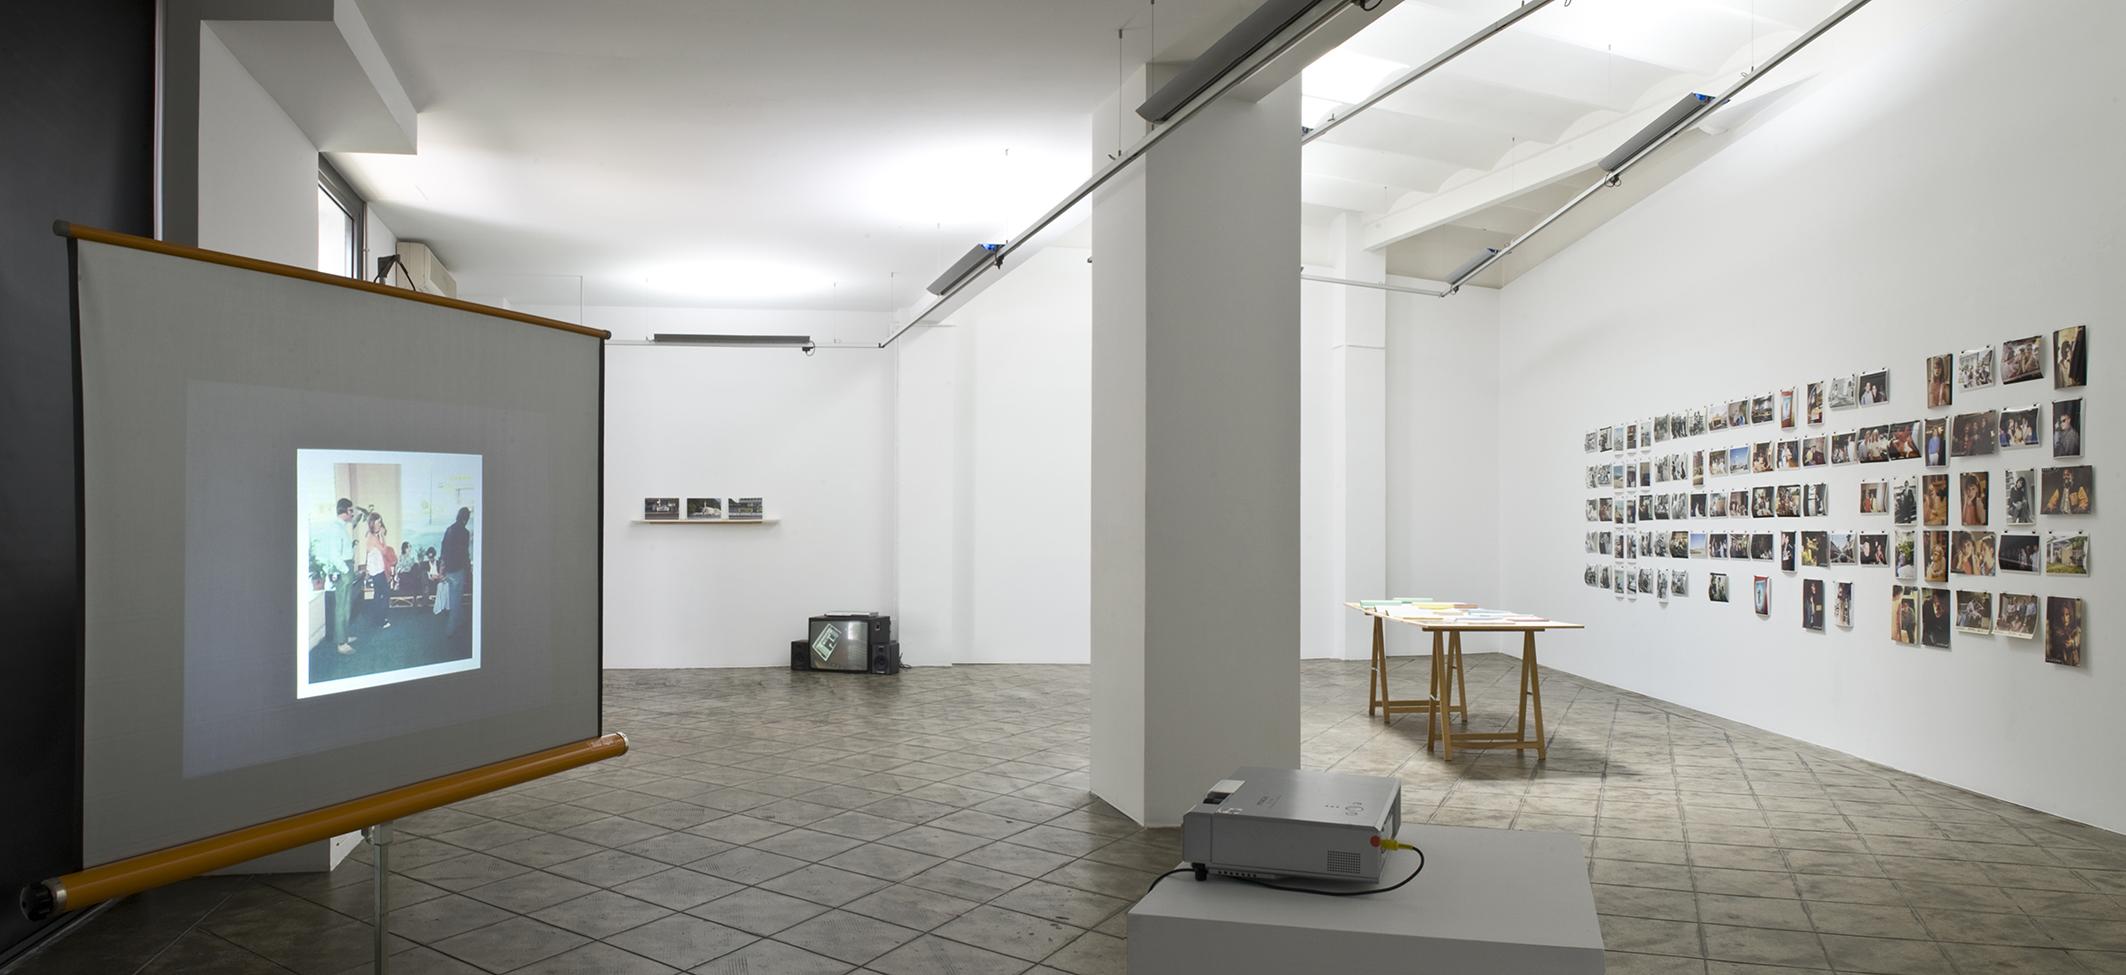 Installation view:The Umbrella Corner. Chapter 6, ProjecteSD, Barcelona, 2013. | The Umbrella Corner. Chapter 6 | ProjecteSD